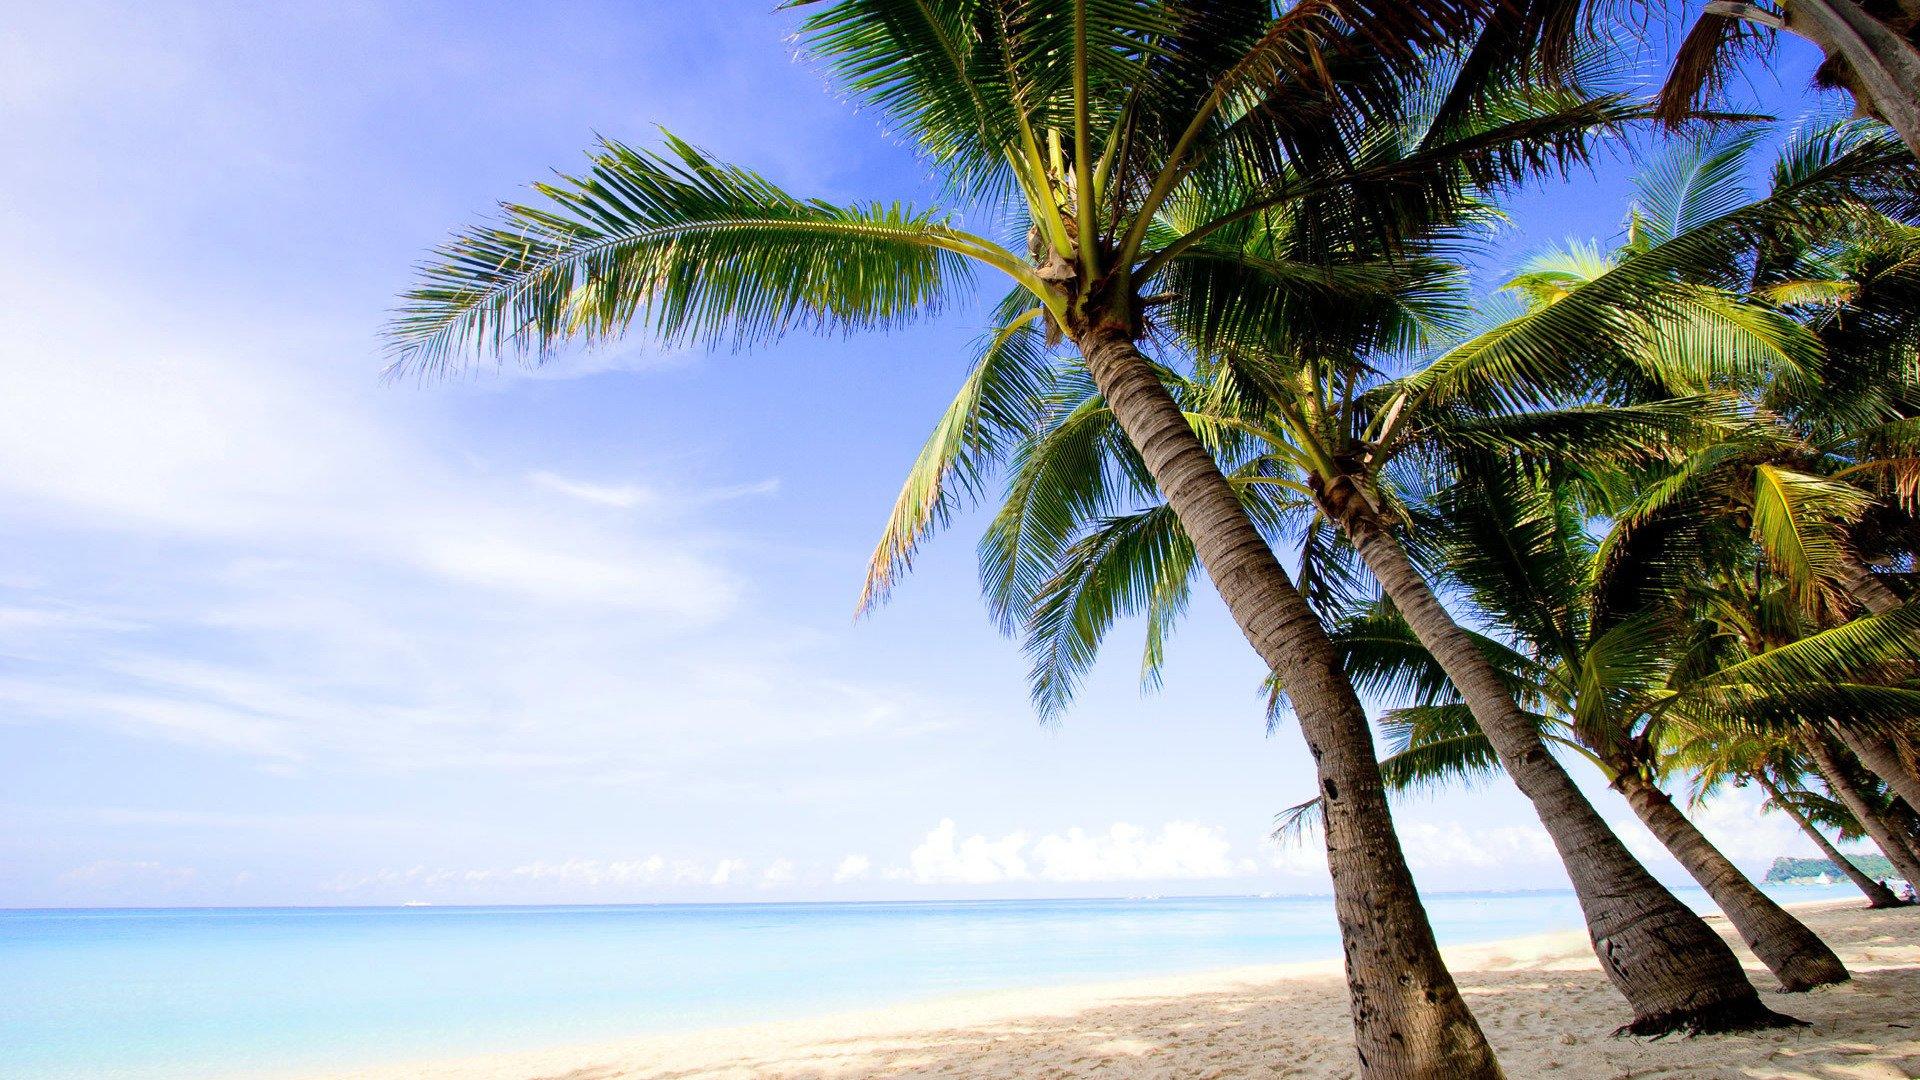 Palm Tree Screensaver HD 1080 wallpaper